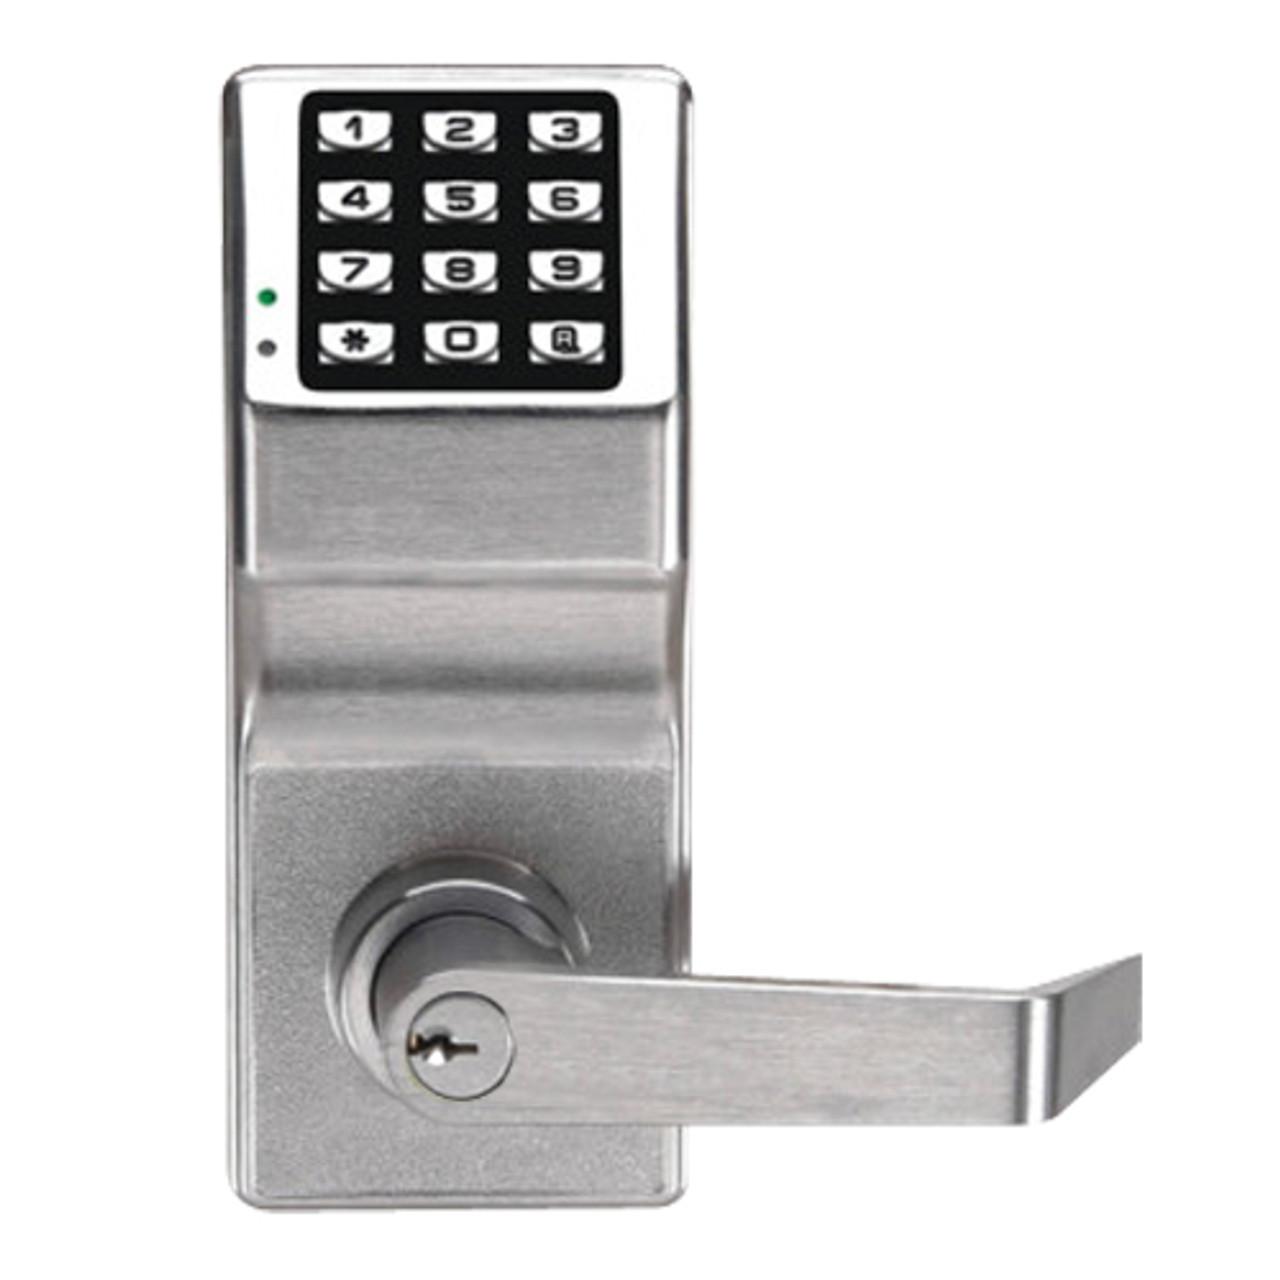 DL2700/US26D T2 Alarm Lock Trilogy Electronic Digital Lock in Satin Chrome Finish